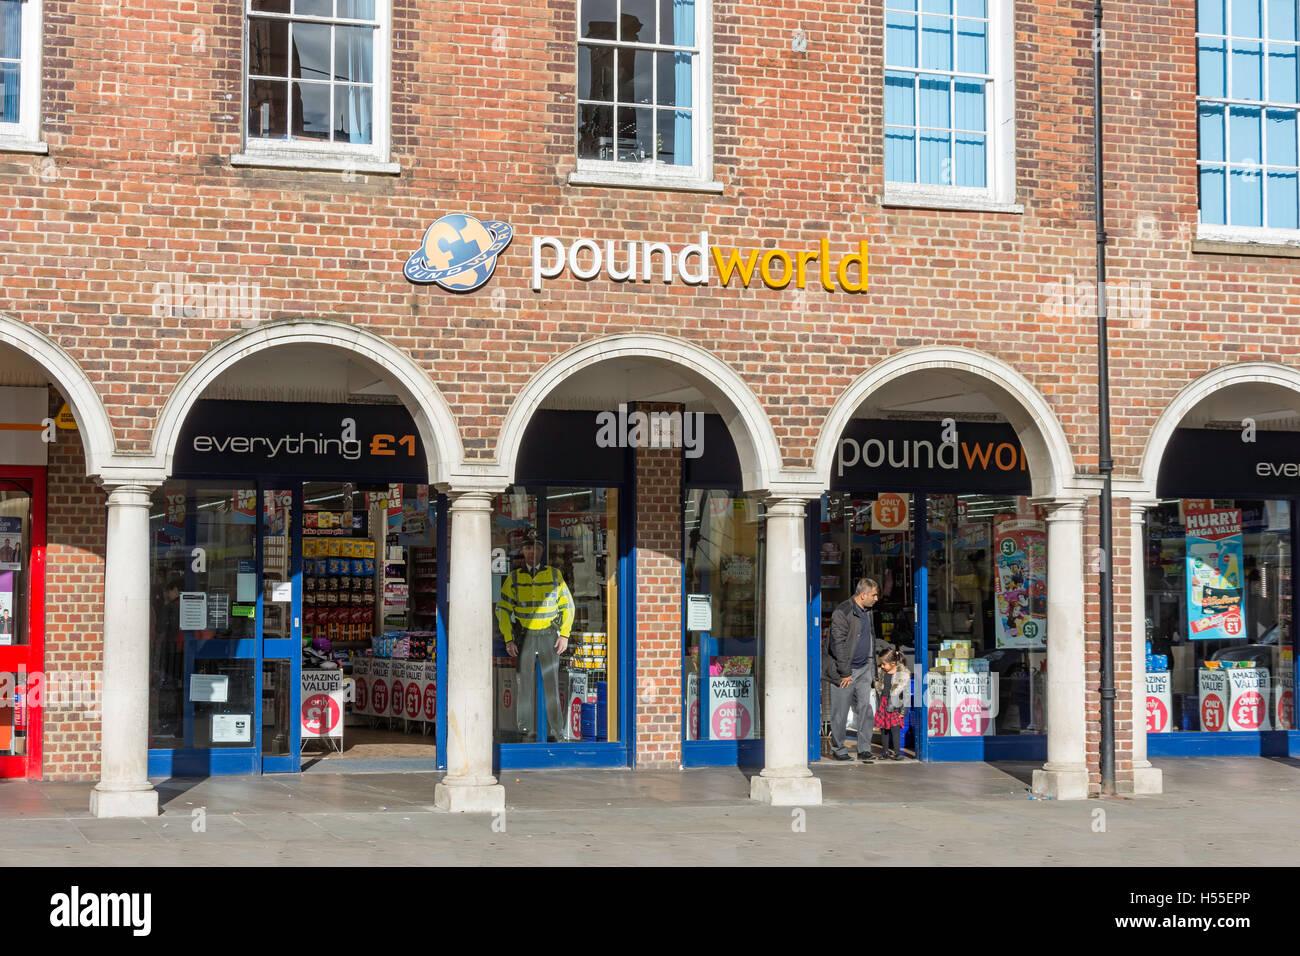 Poundworld discount store, High Street, High Wycombe, Buckinghamshire, England, United Kingdom - Stock Image